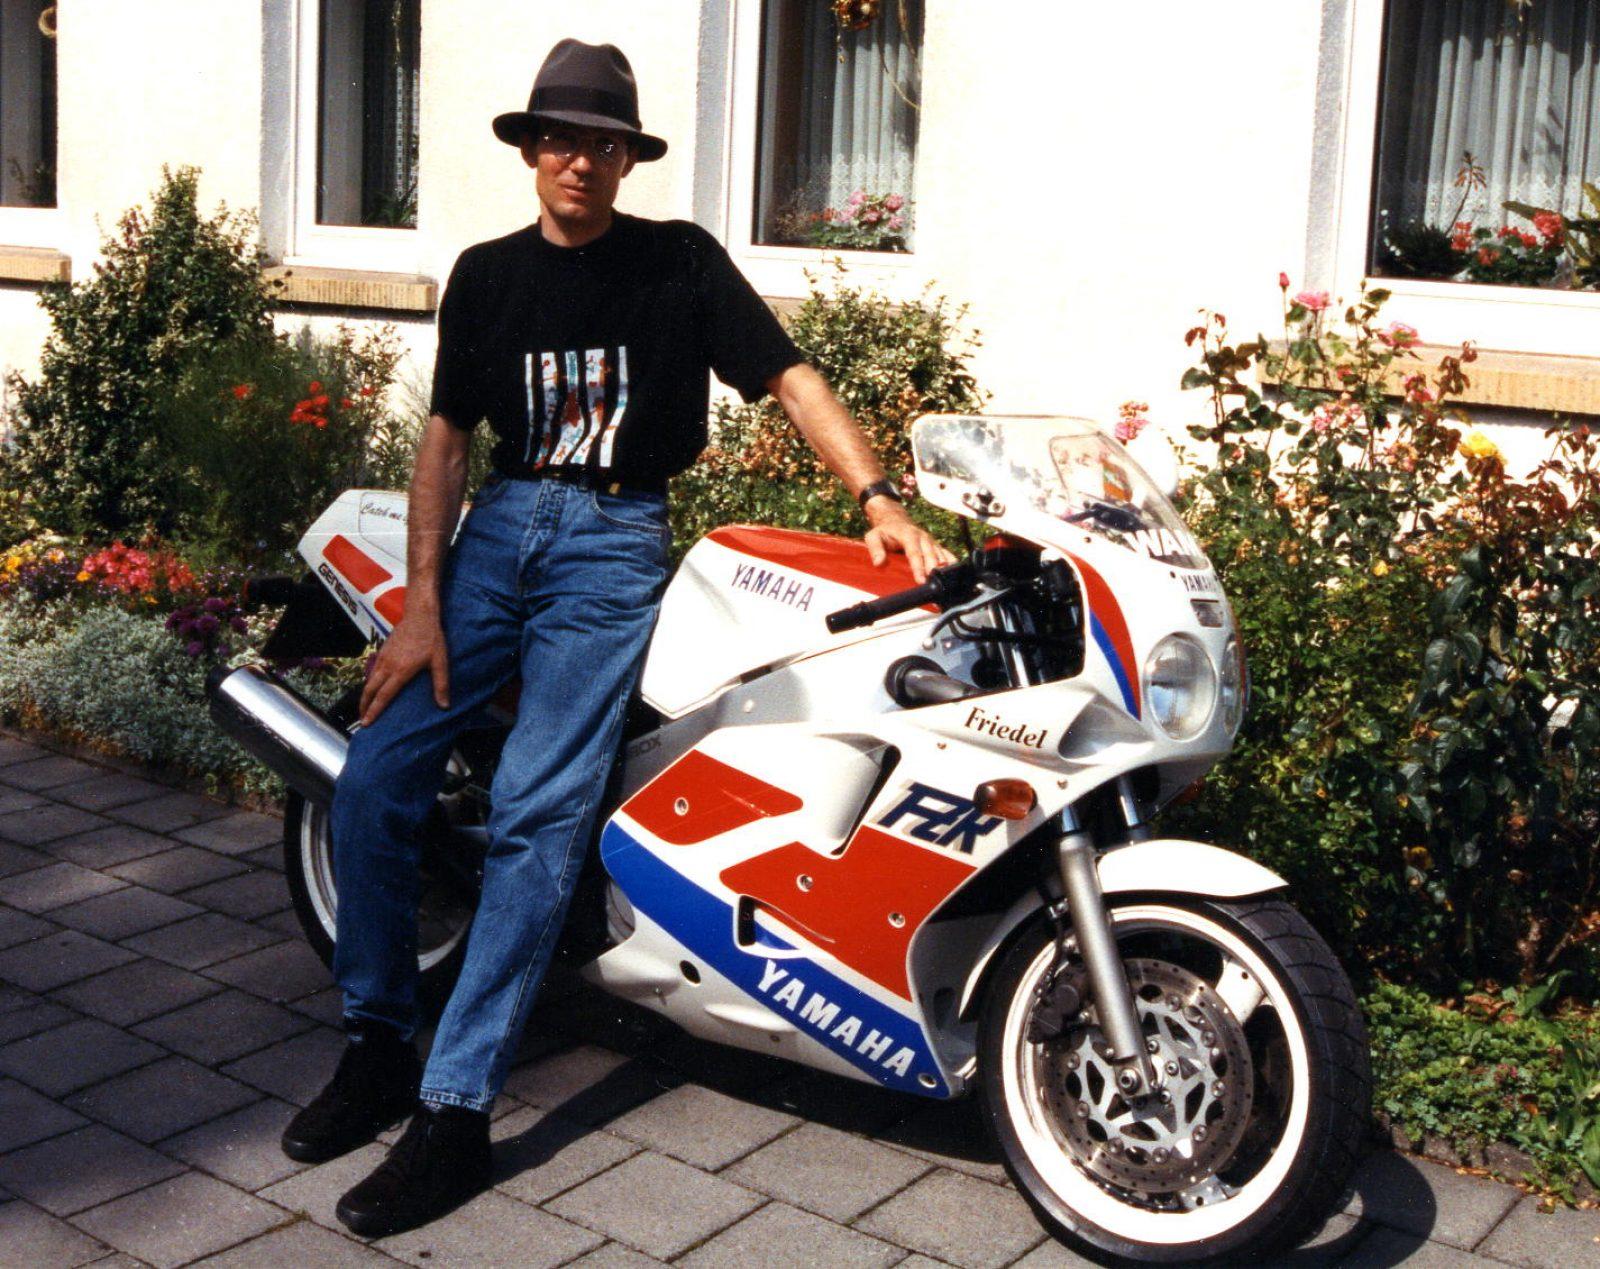 1993 Yamaha FZR1000 FW